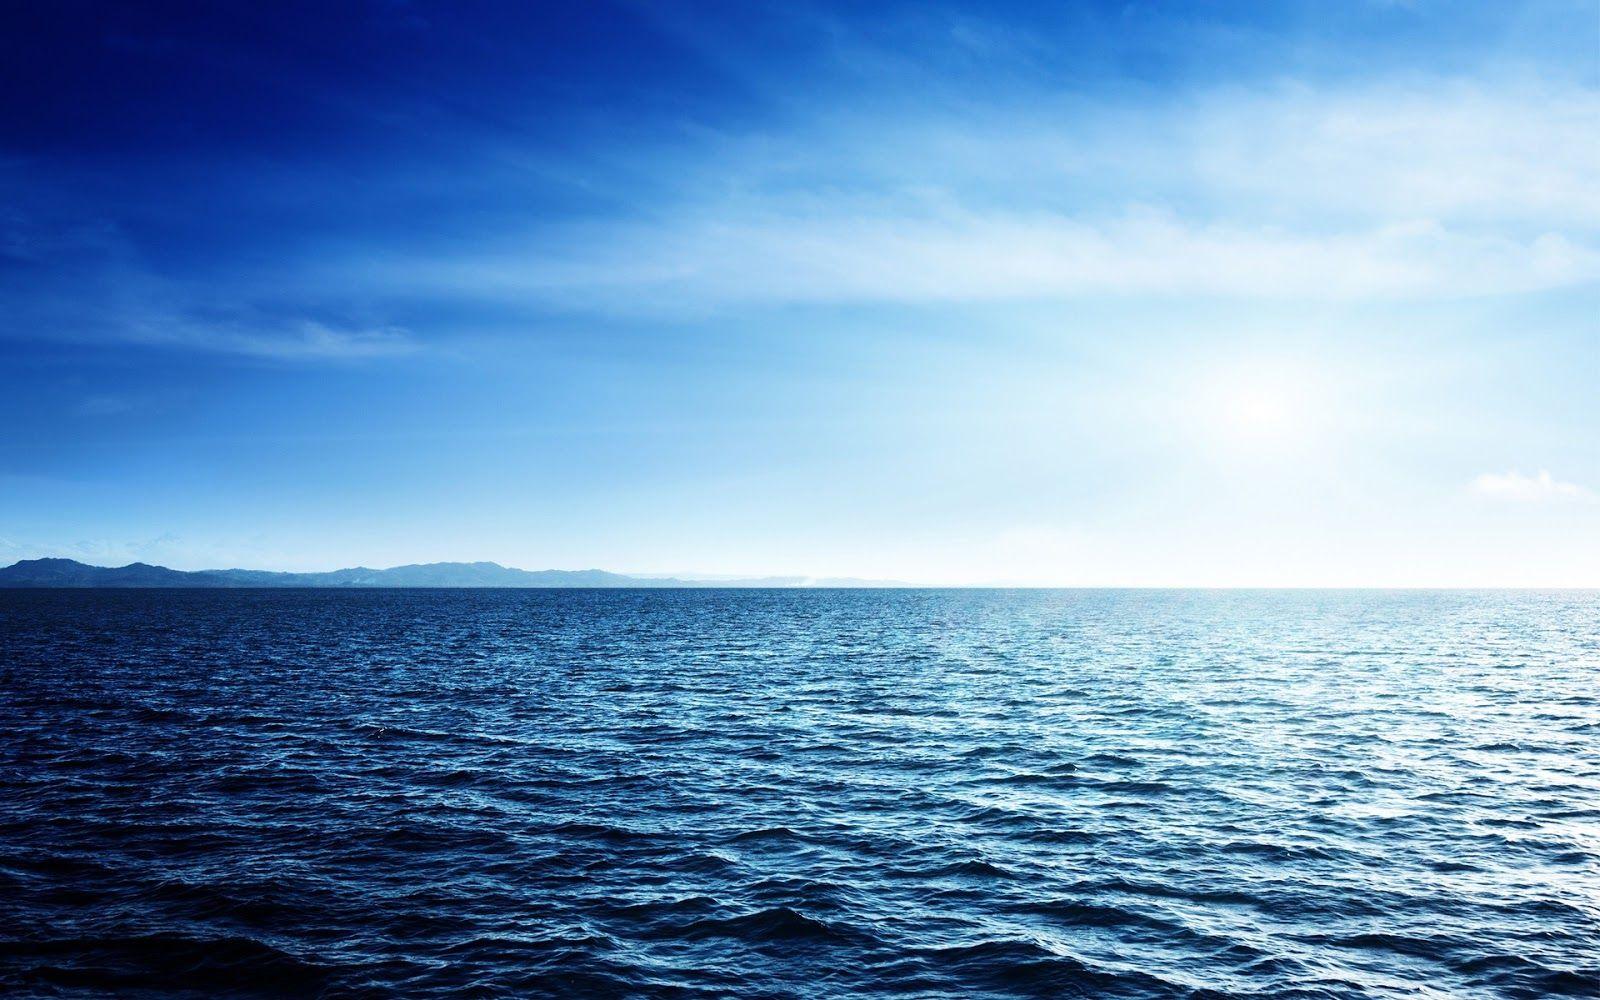 Ocean Landscape Ocean Landscape Ocean Landscape Wallpaper